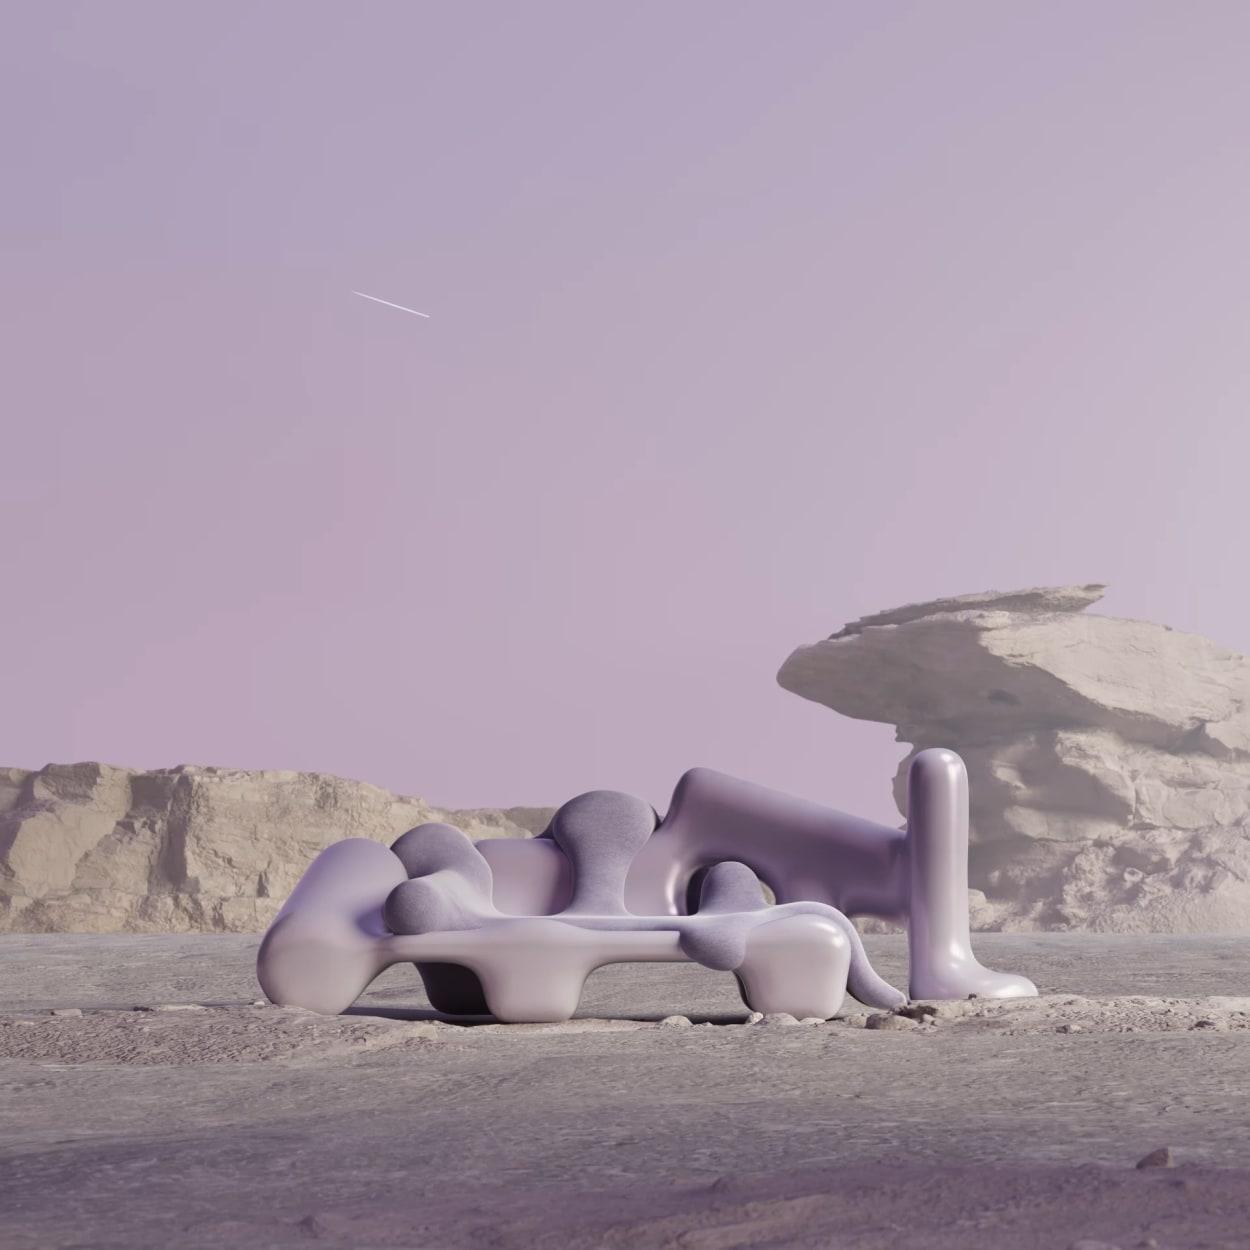 Andrés Reisinger, The Shipping, Kollektion, Auktion, 3D, Möbel